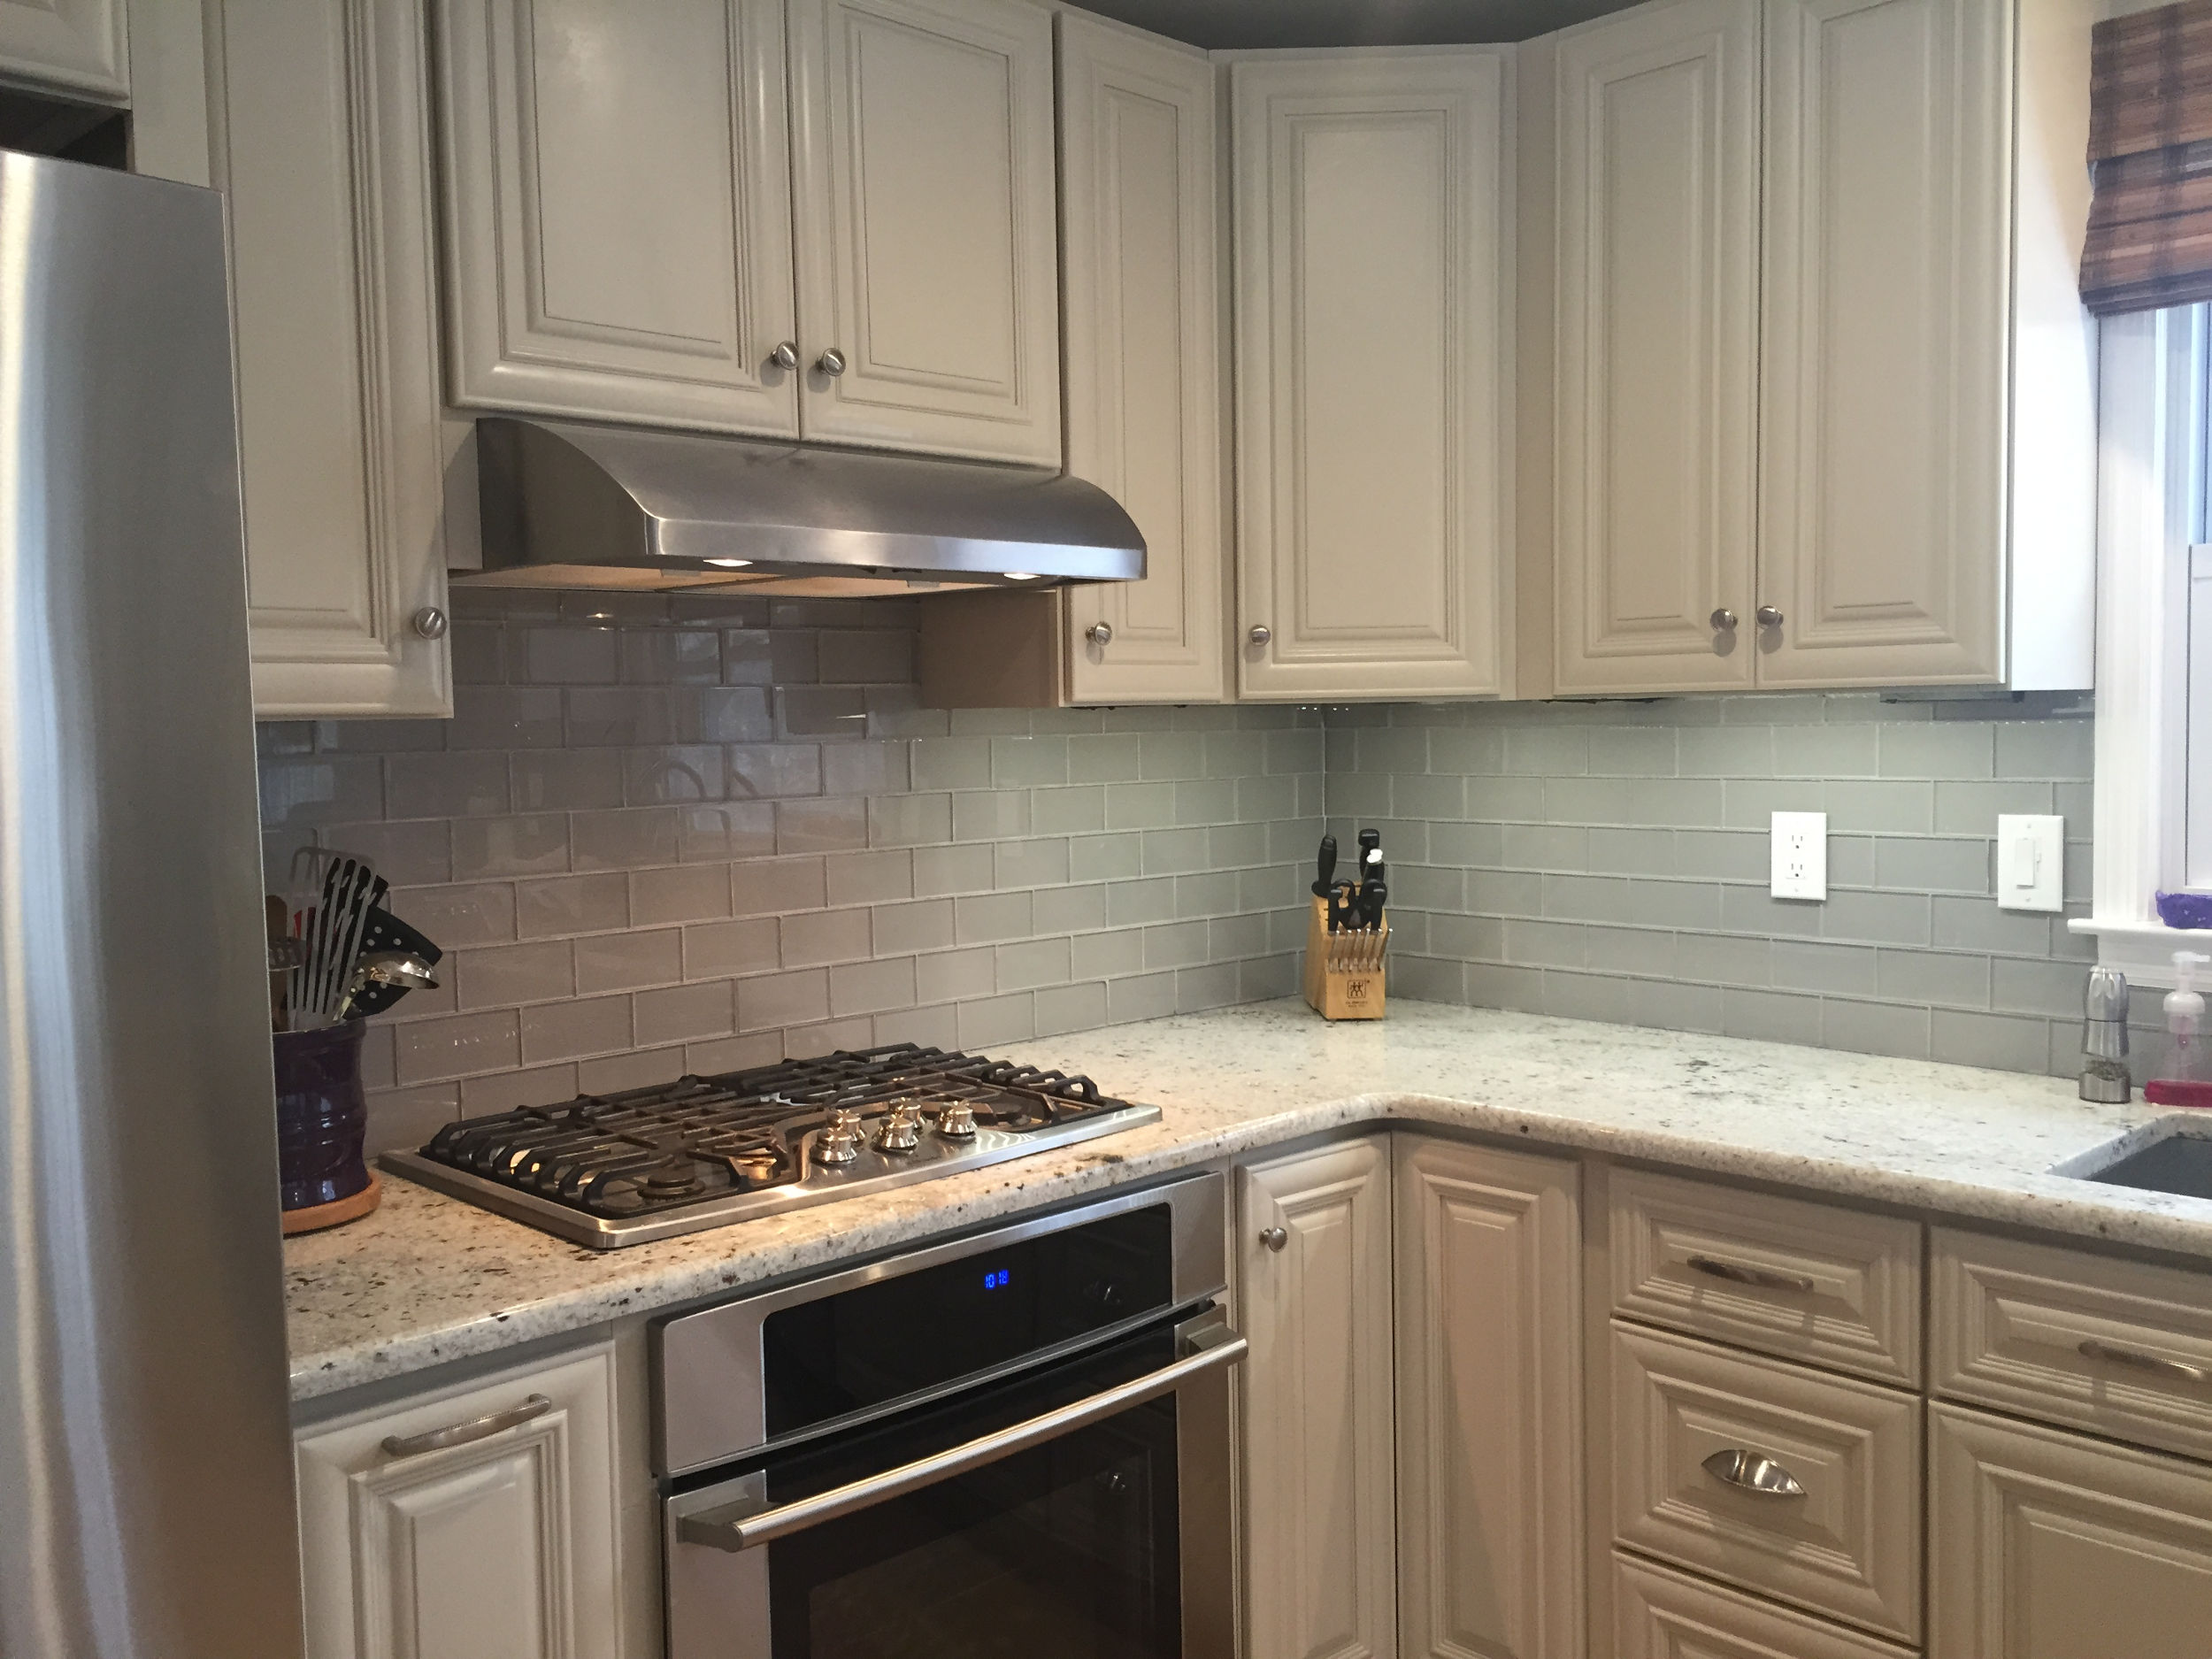 kitchen cabinets backsplash ideas photo - 2